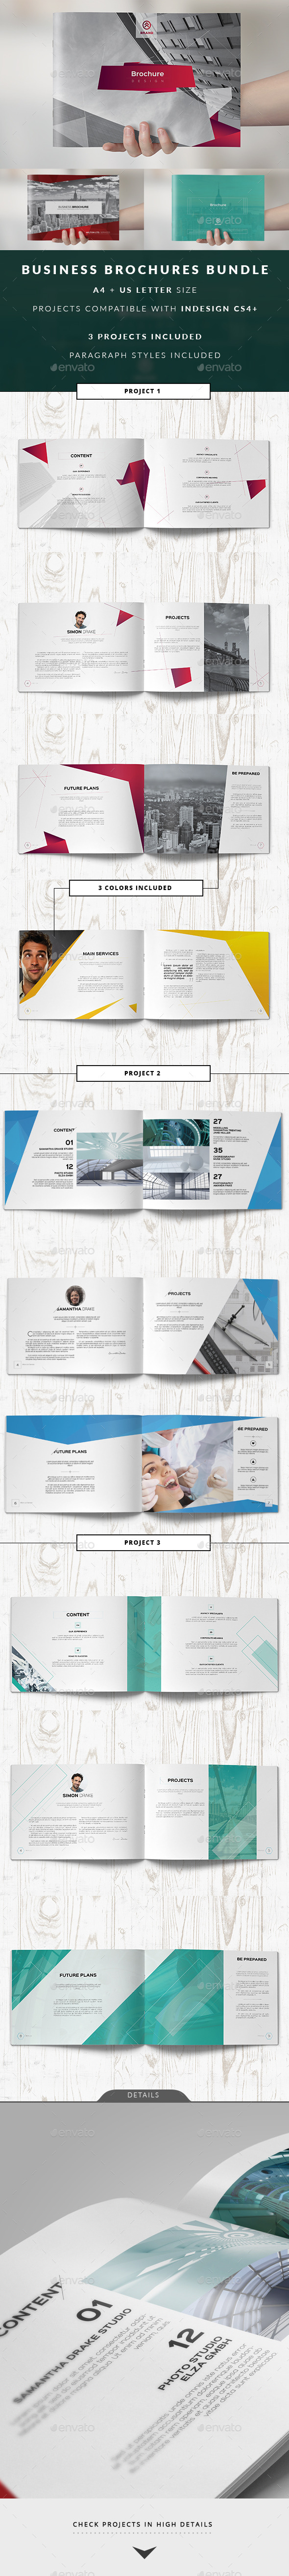 GraphicRiver Multipurpose Business Catalog Brochure Bundle 11426278